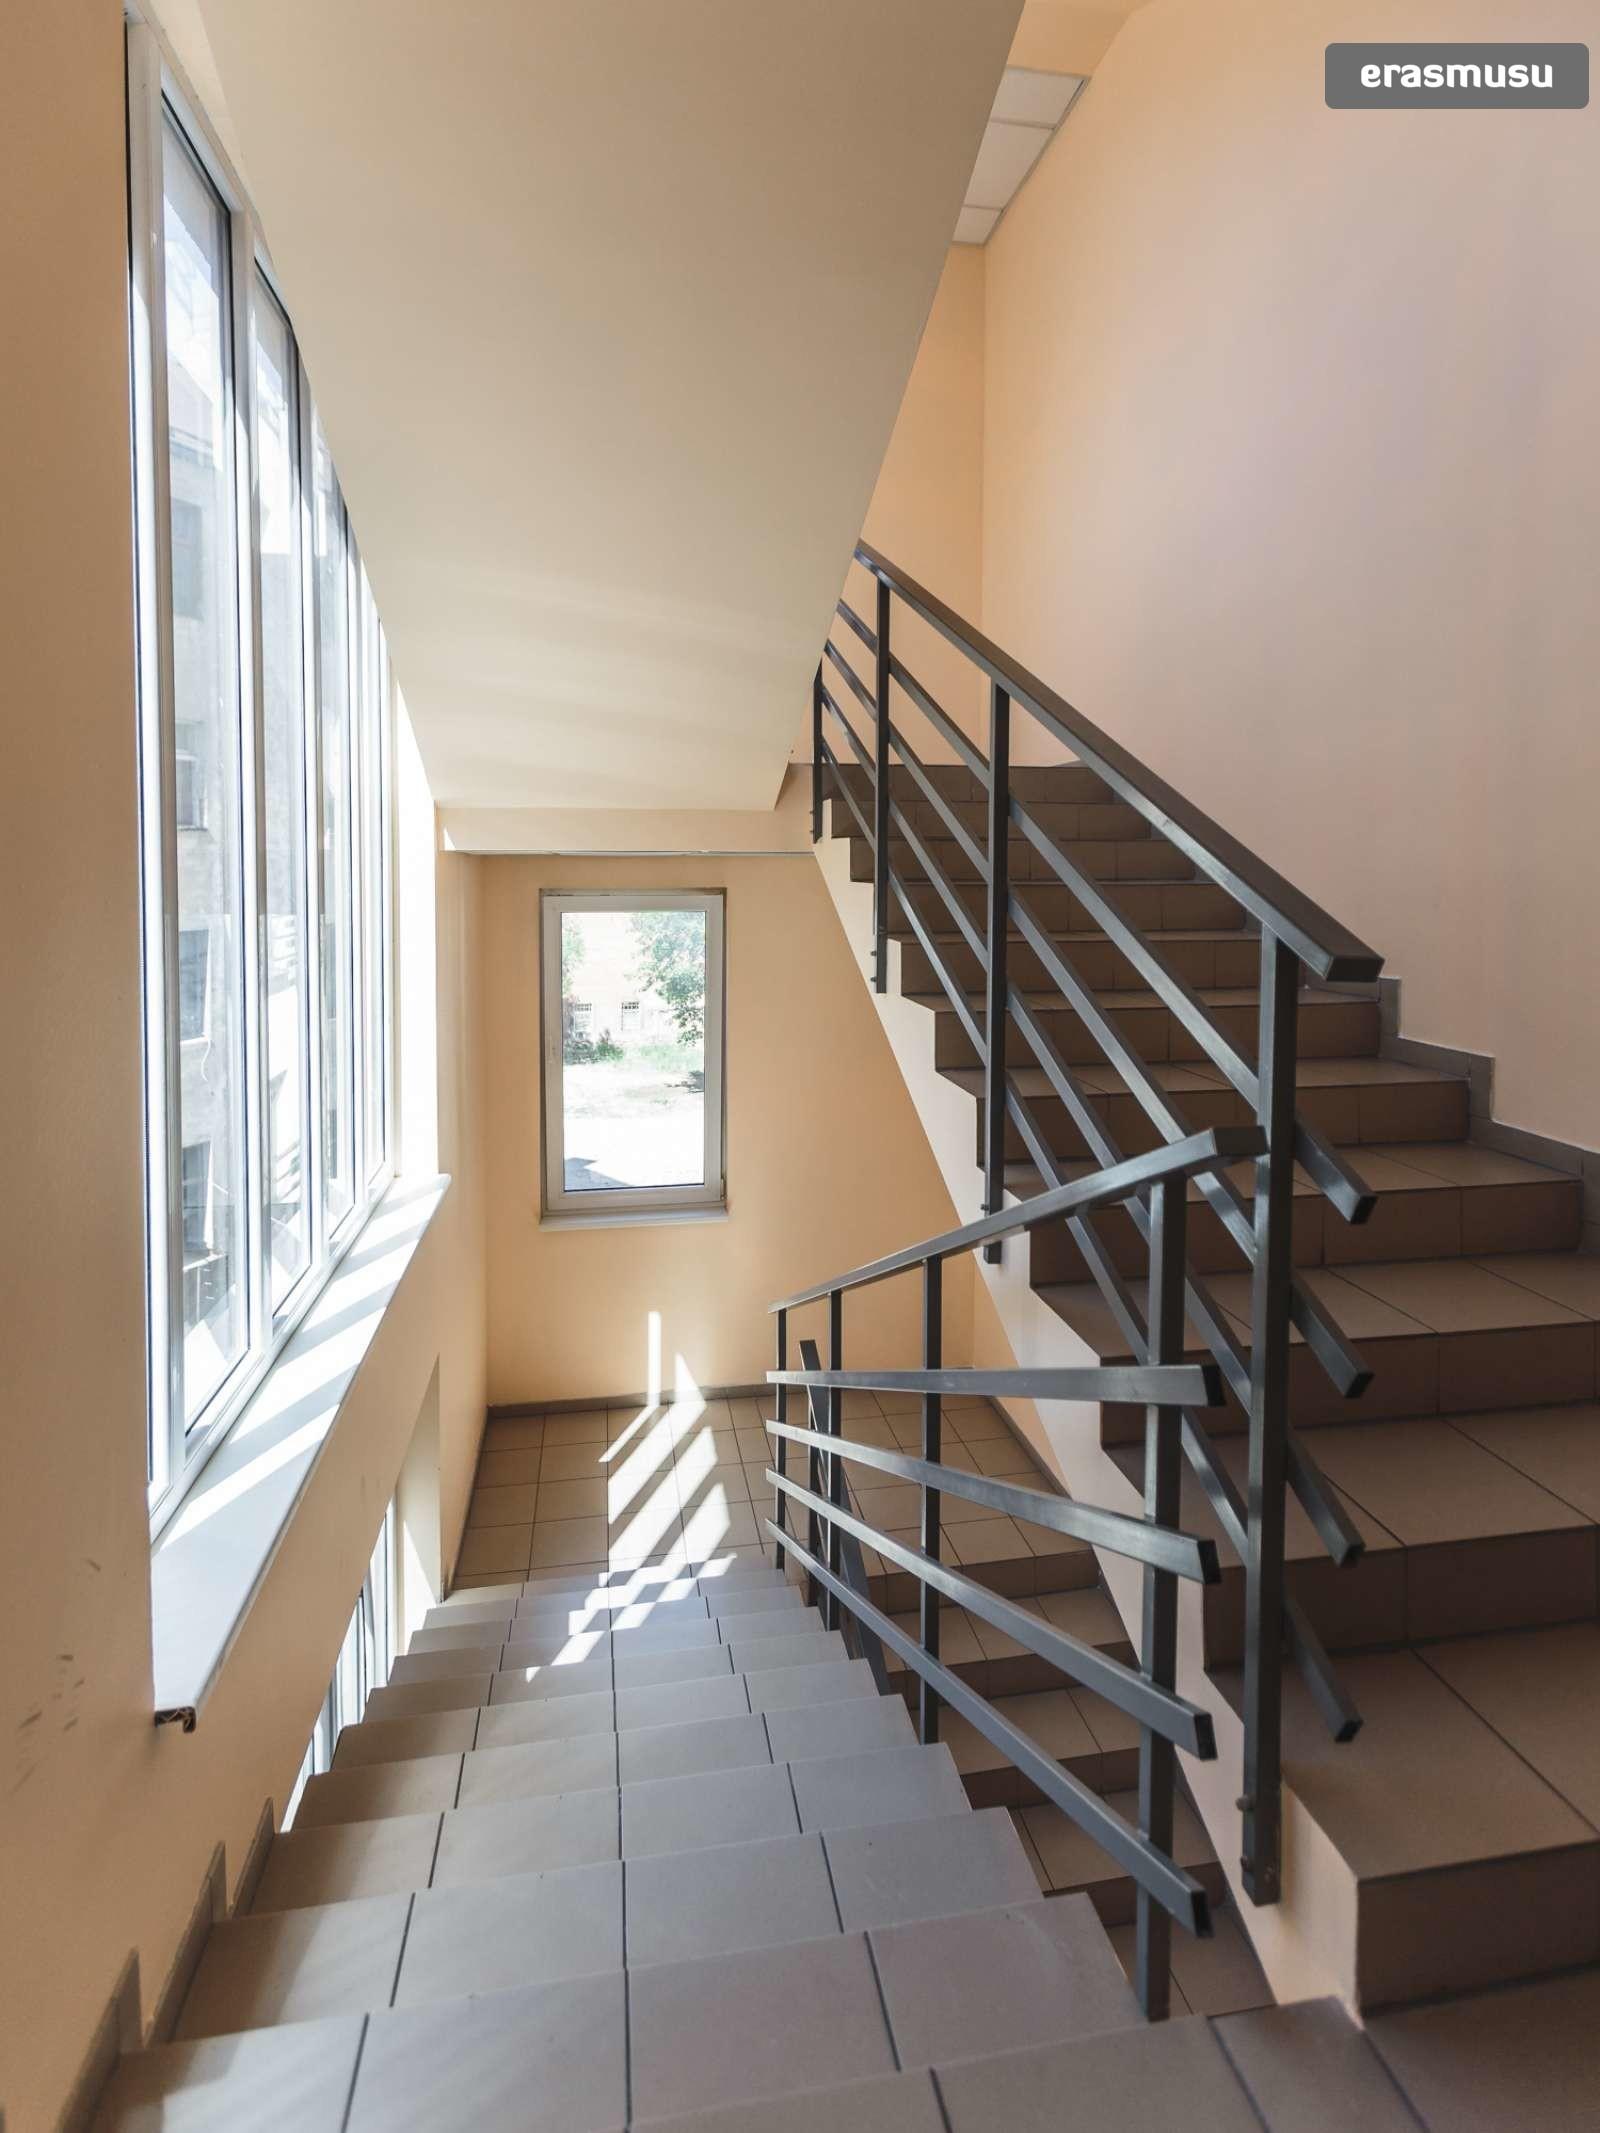 1-bedroom-apartment-rent-maskavas-forstate-112e354db6e2863ecd2b6